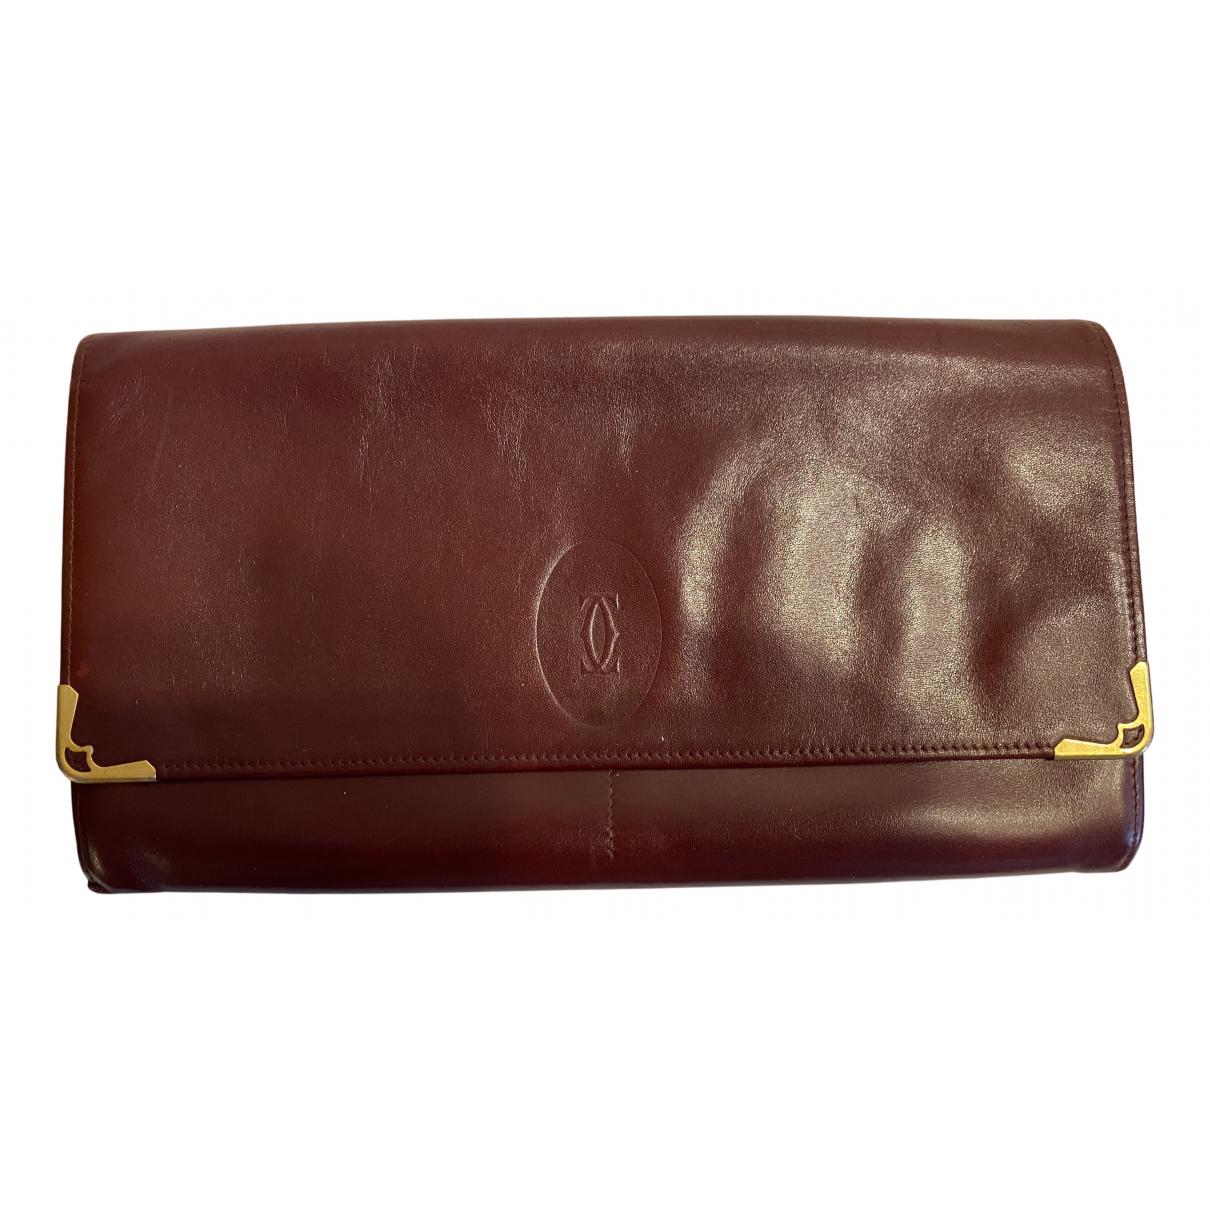 Cartier N Burgundy Leather Clutch bag for Women N